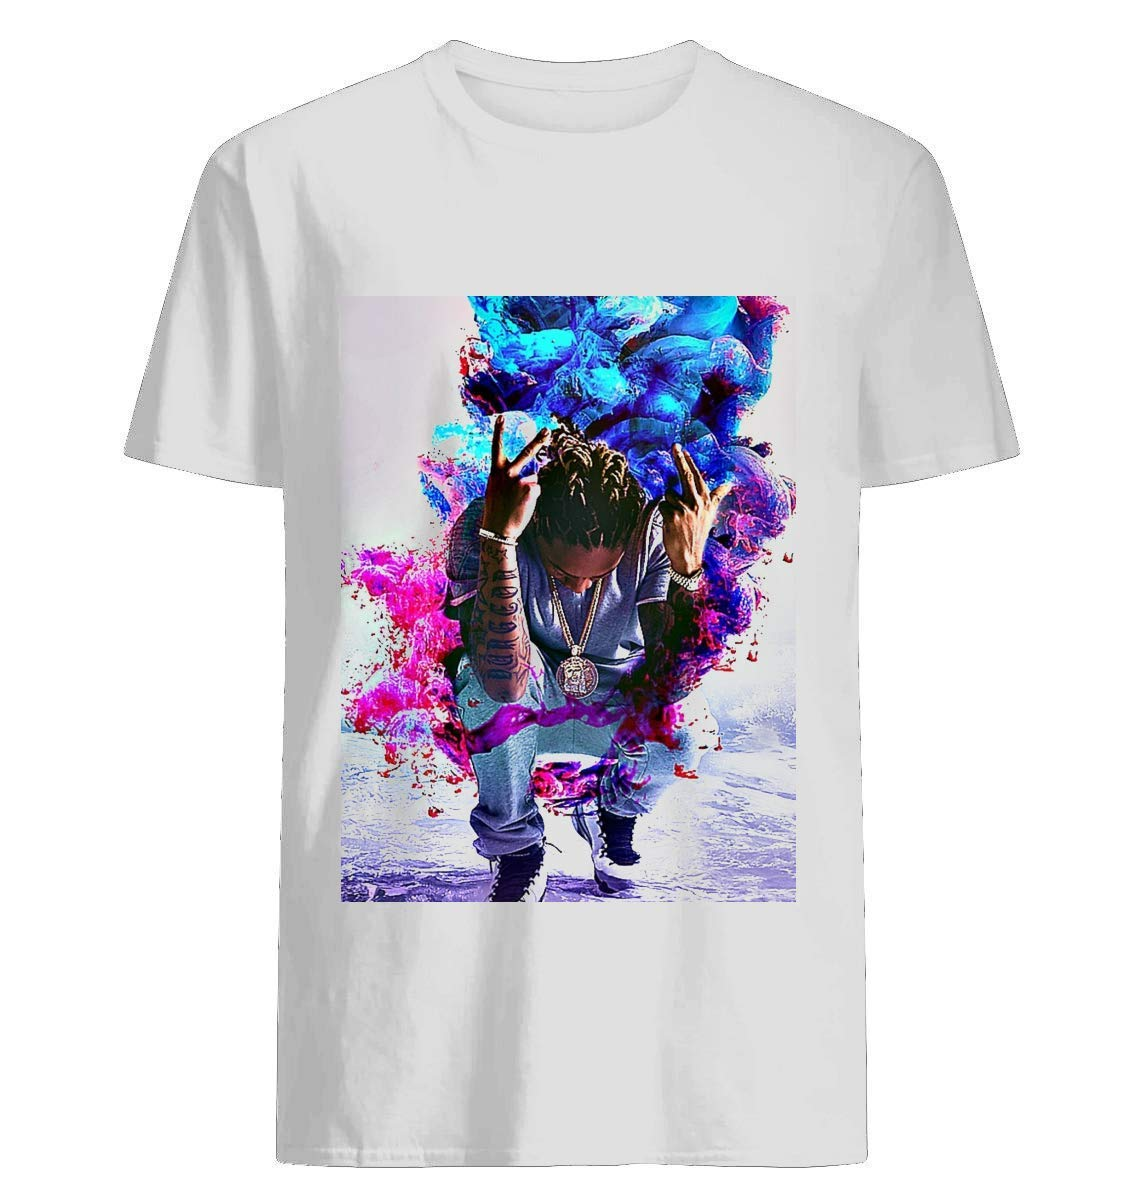 Future Dirty Sprite Shirts